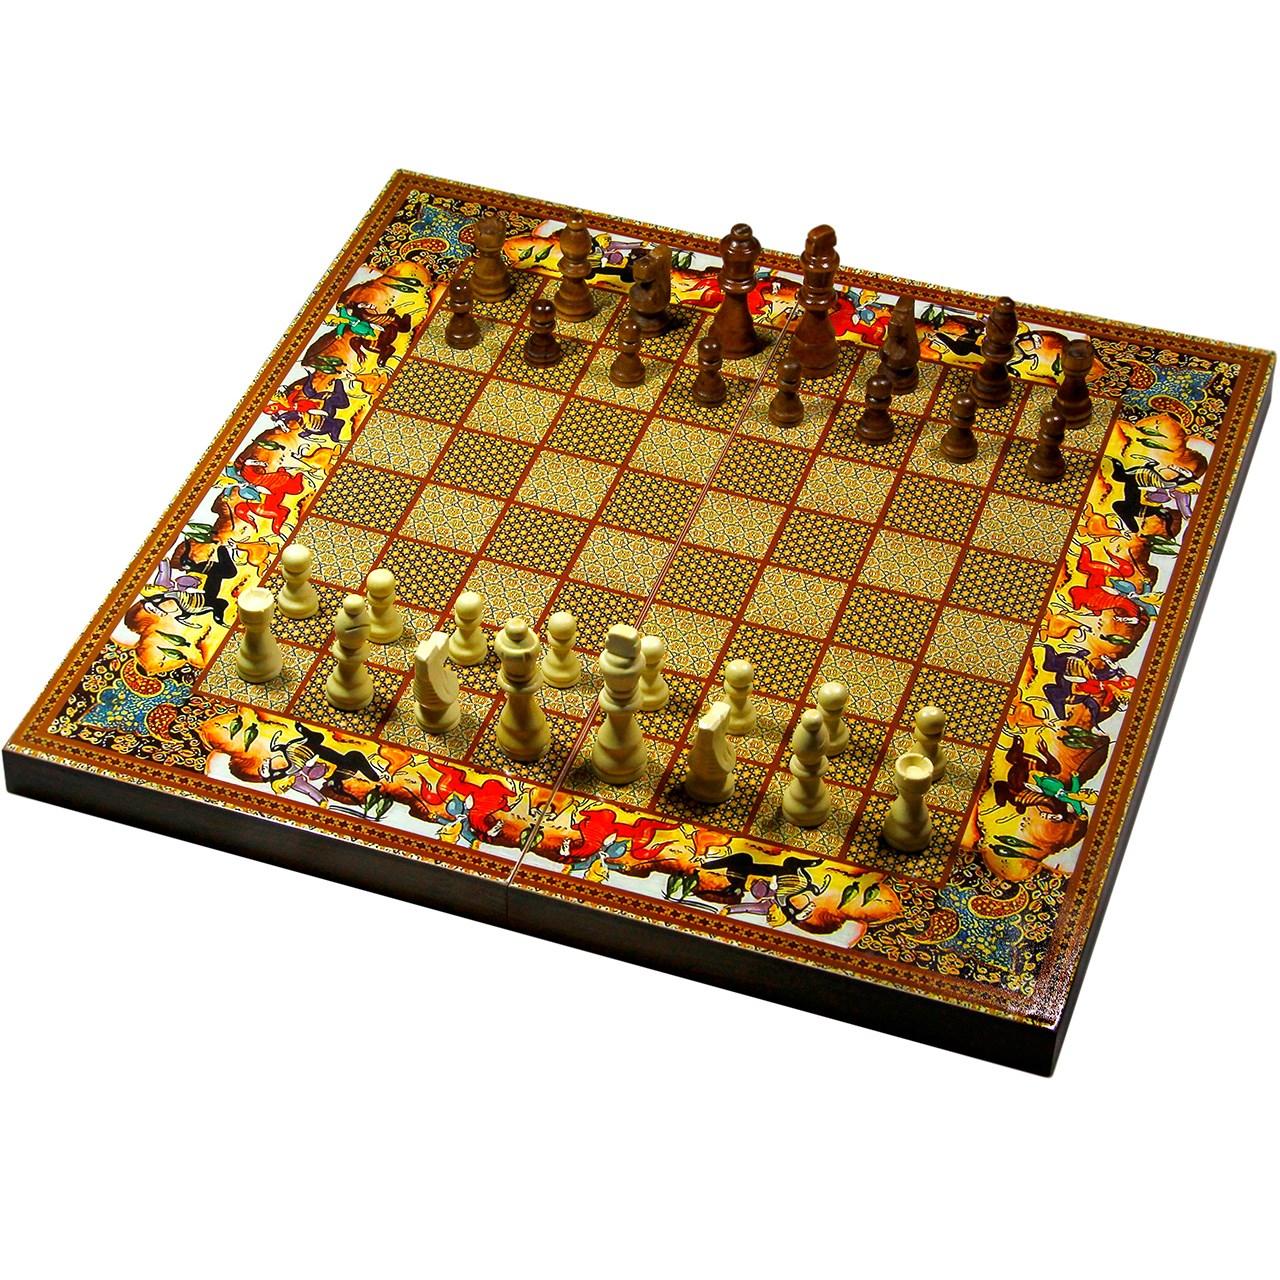 شطرنج الف با کد 308